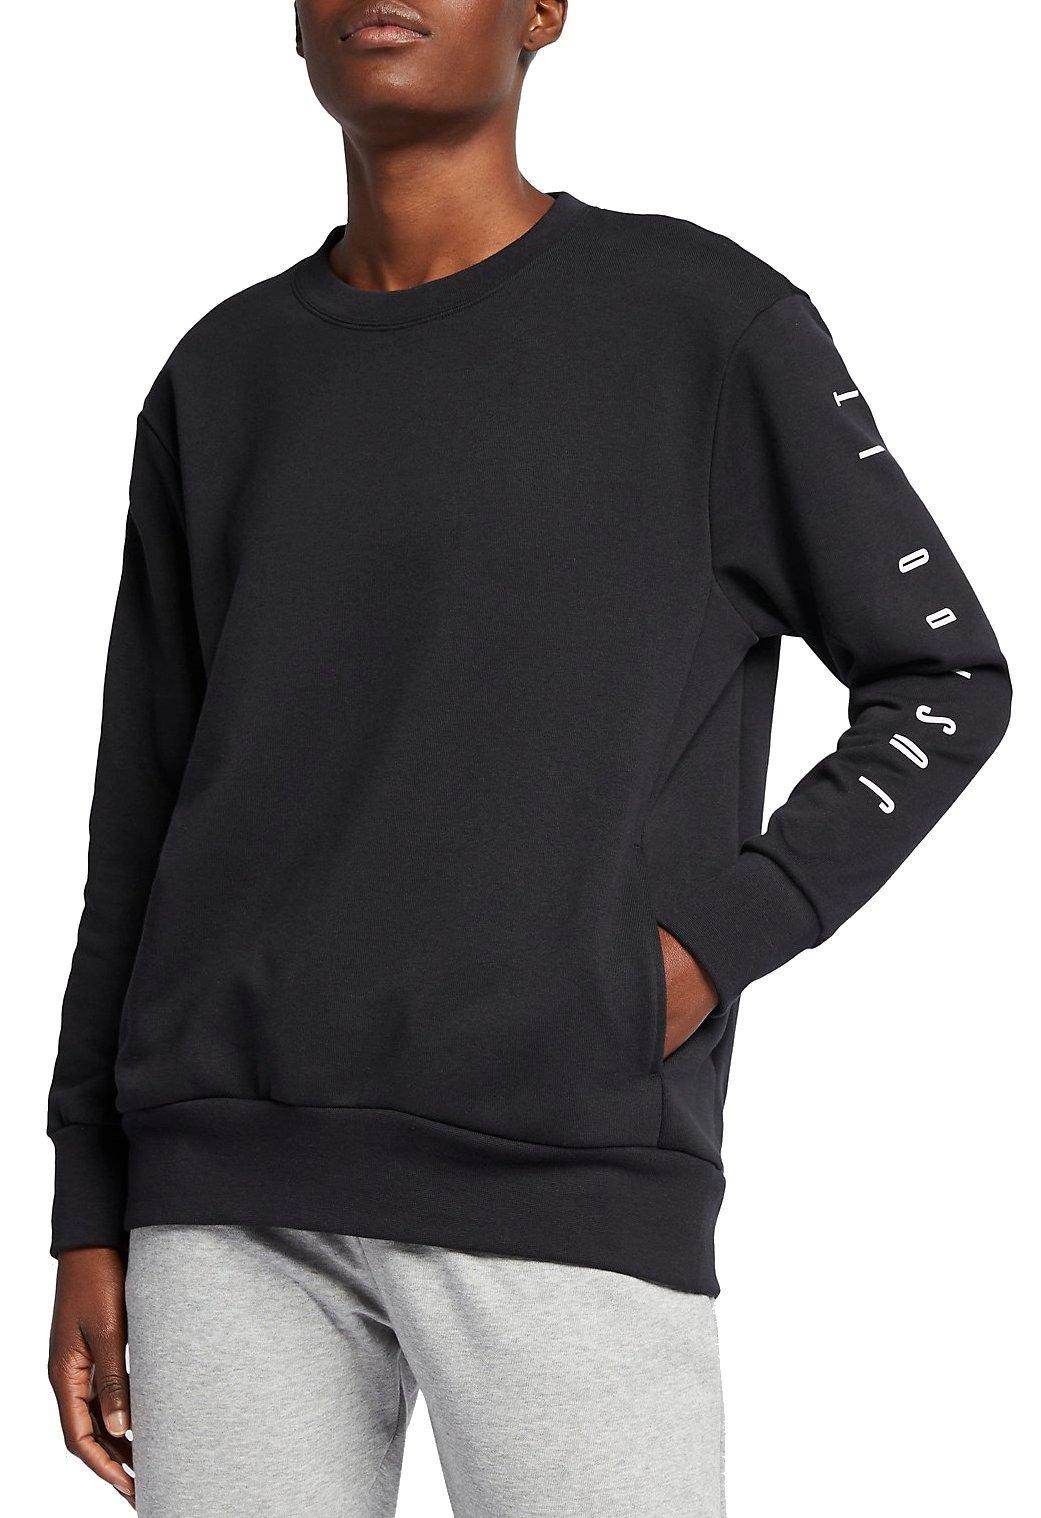 Sweatshirt Nike W NK DRY TOP LS CREW GRX Top4Fitness.at